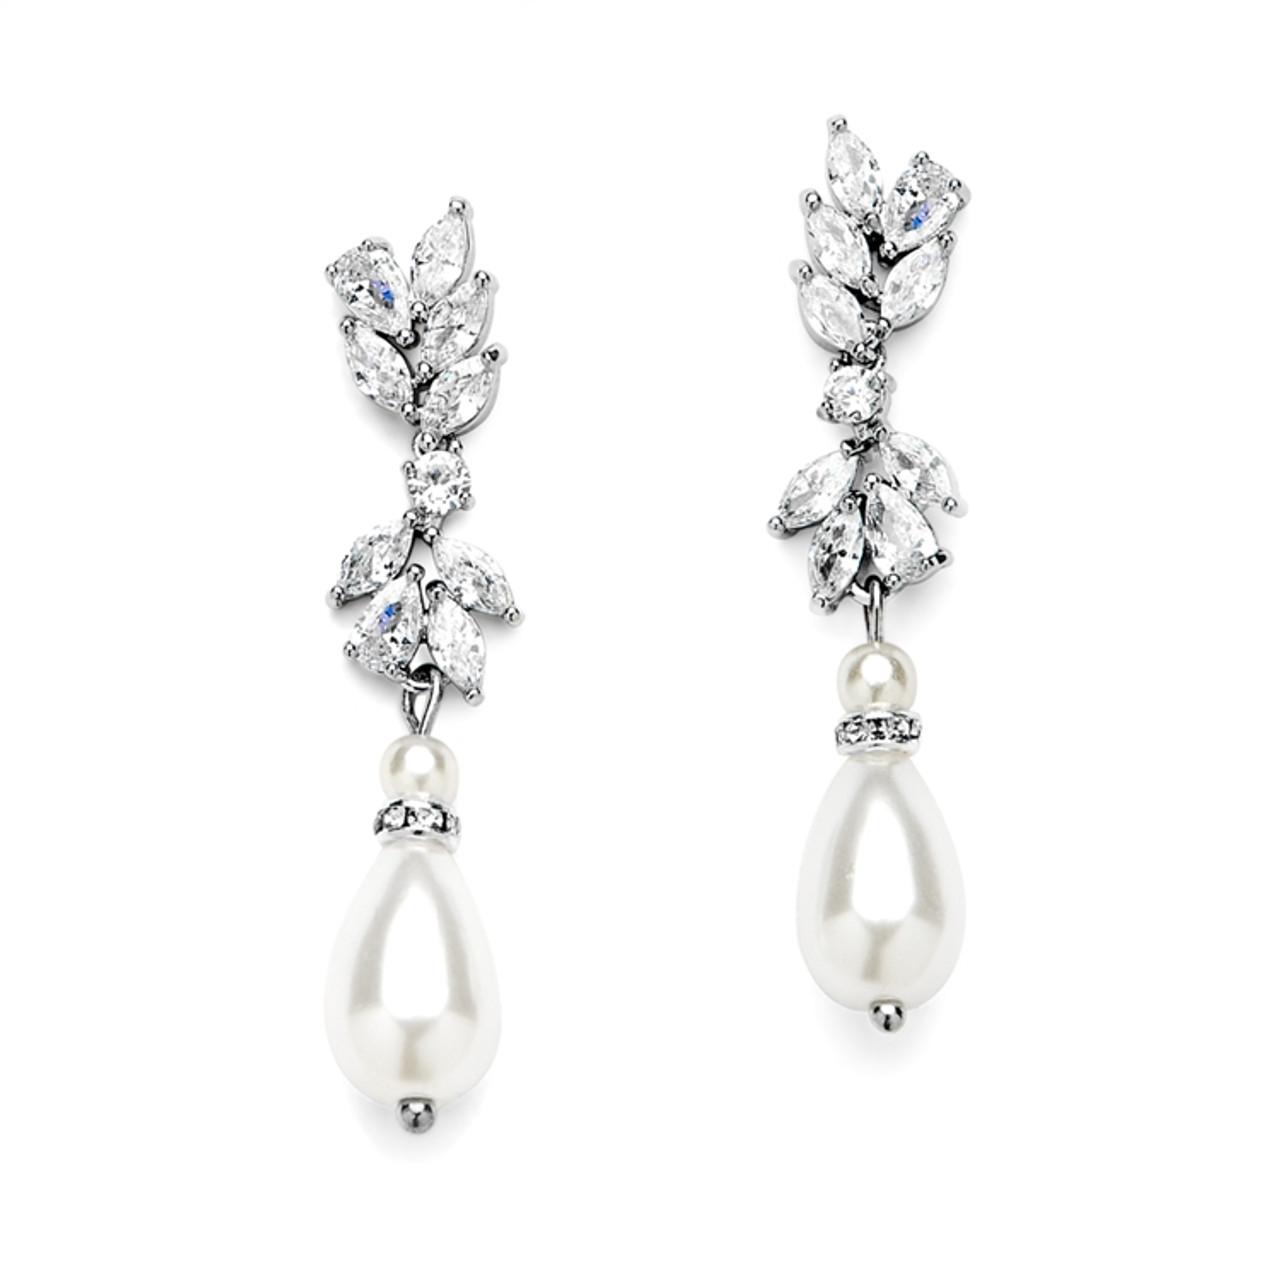 Cubic Zirconia and Teardrop Pearl Designer Bridal Earrings 4646E-I-S